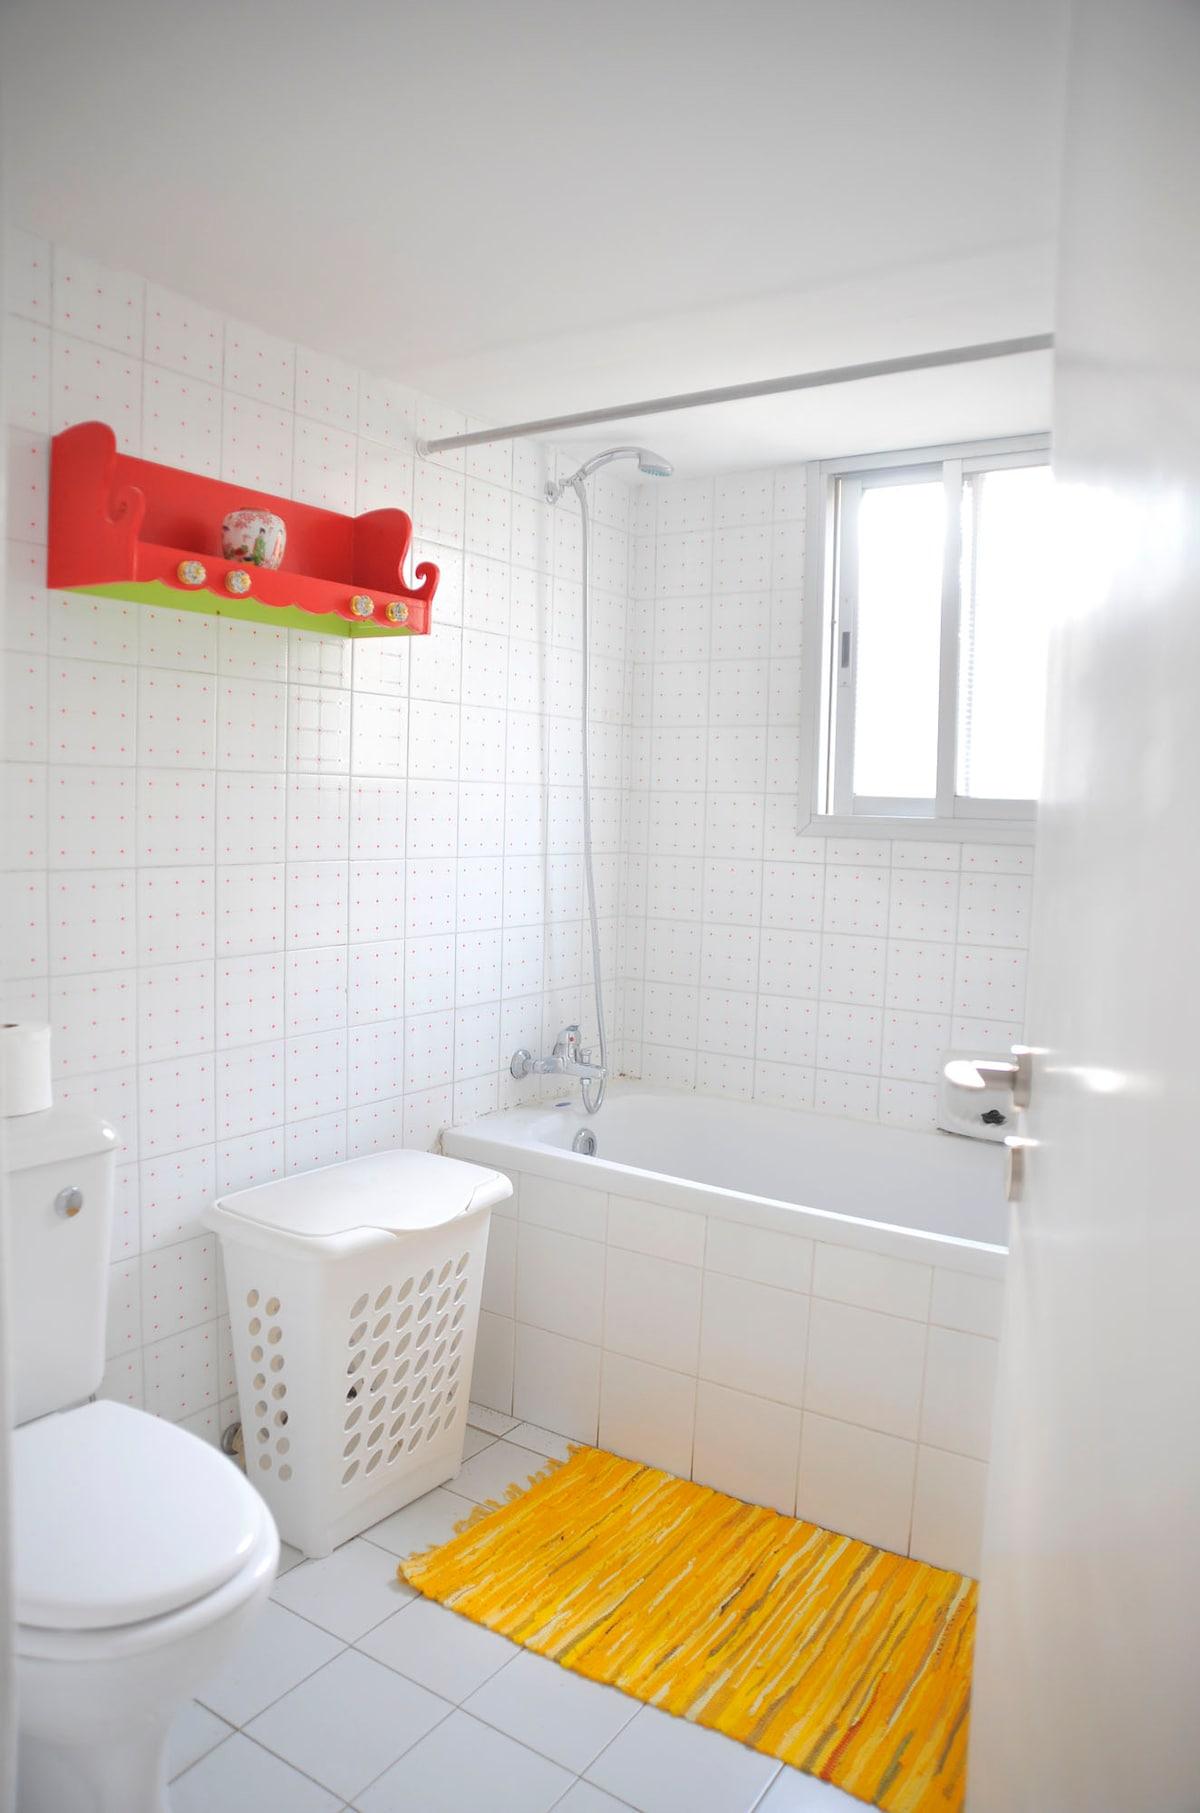 Bathroom with Buthtub